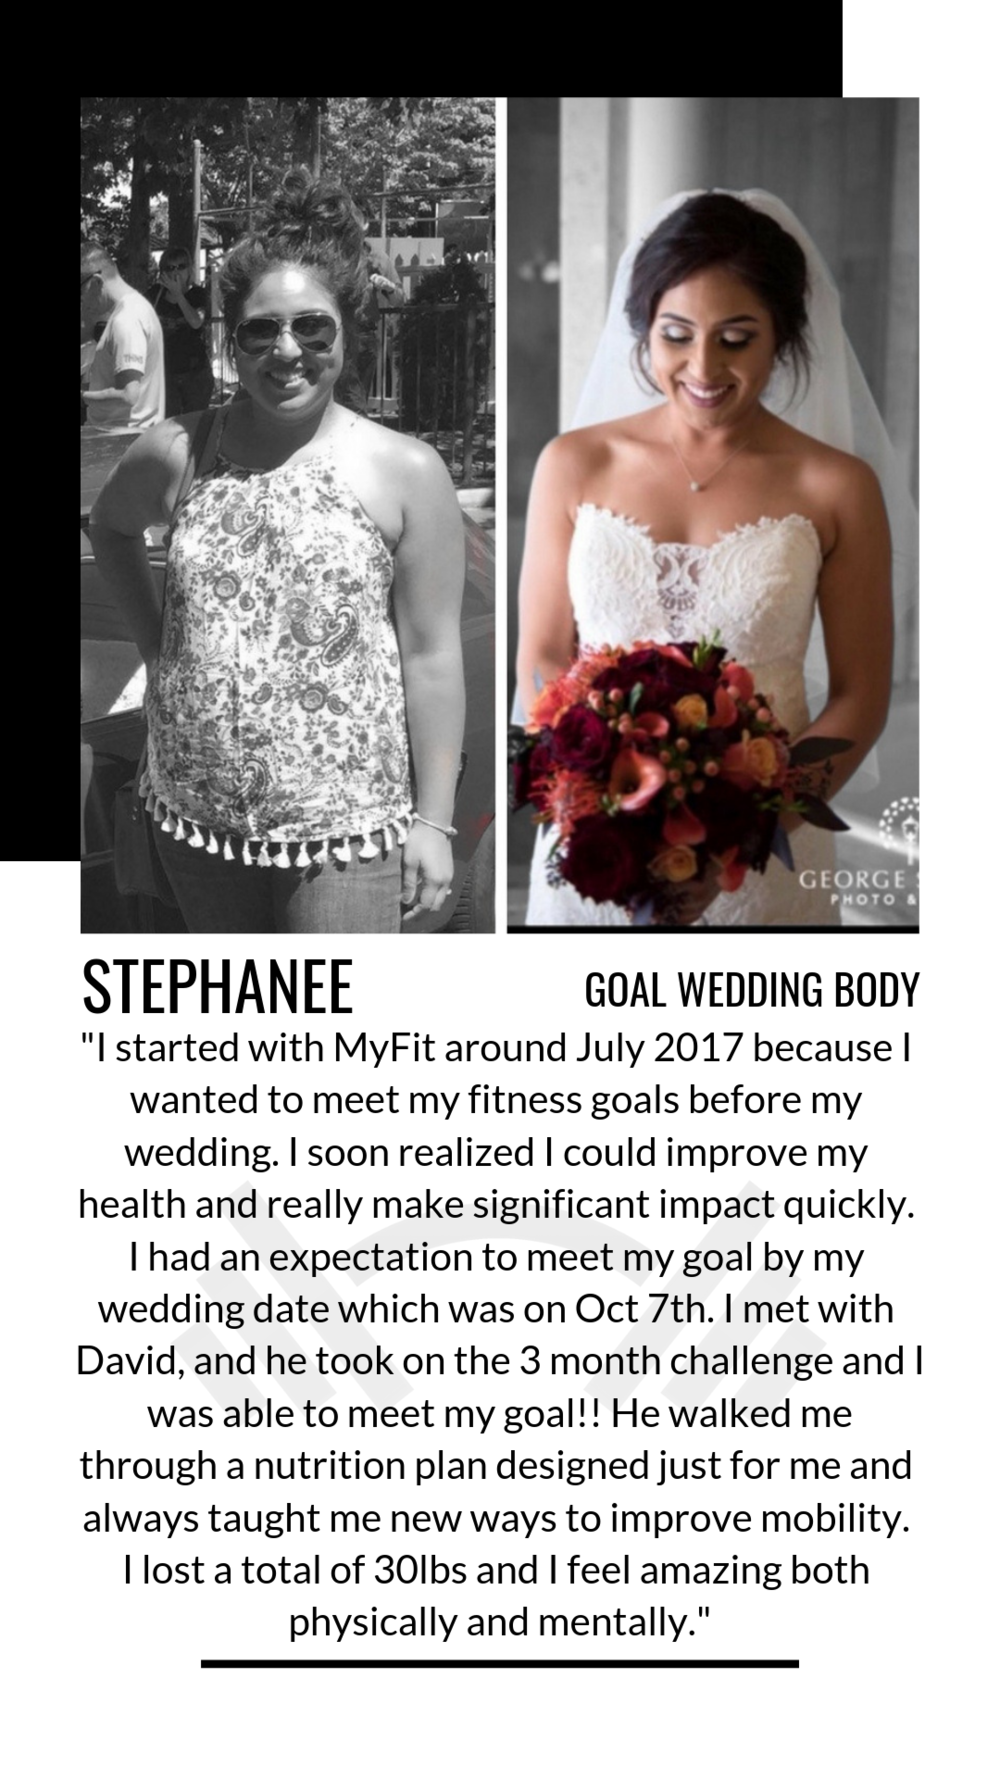 Goal Wedding Body